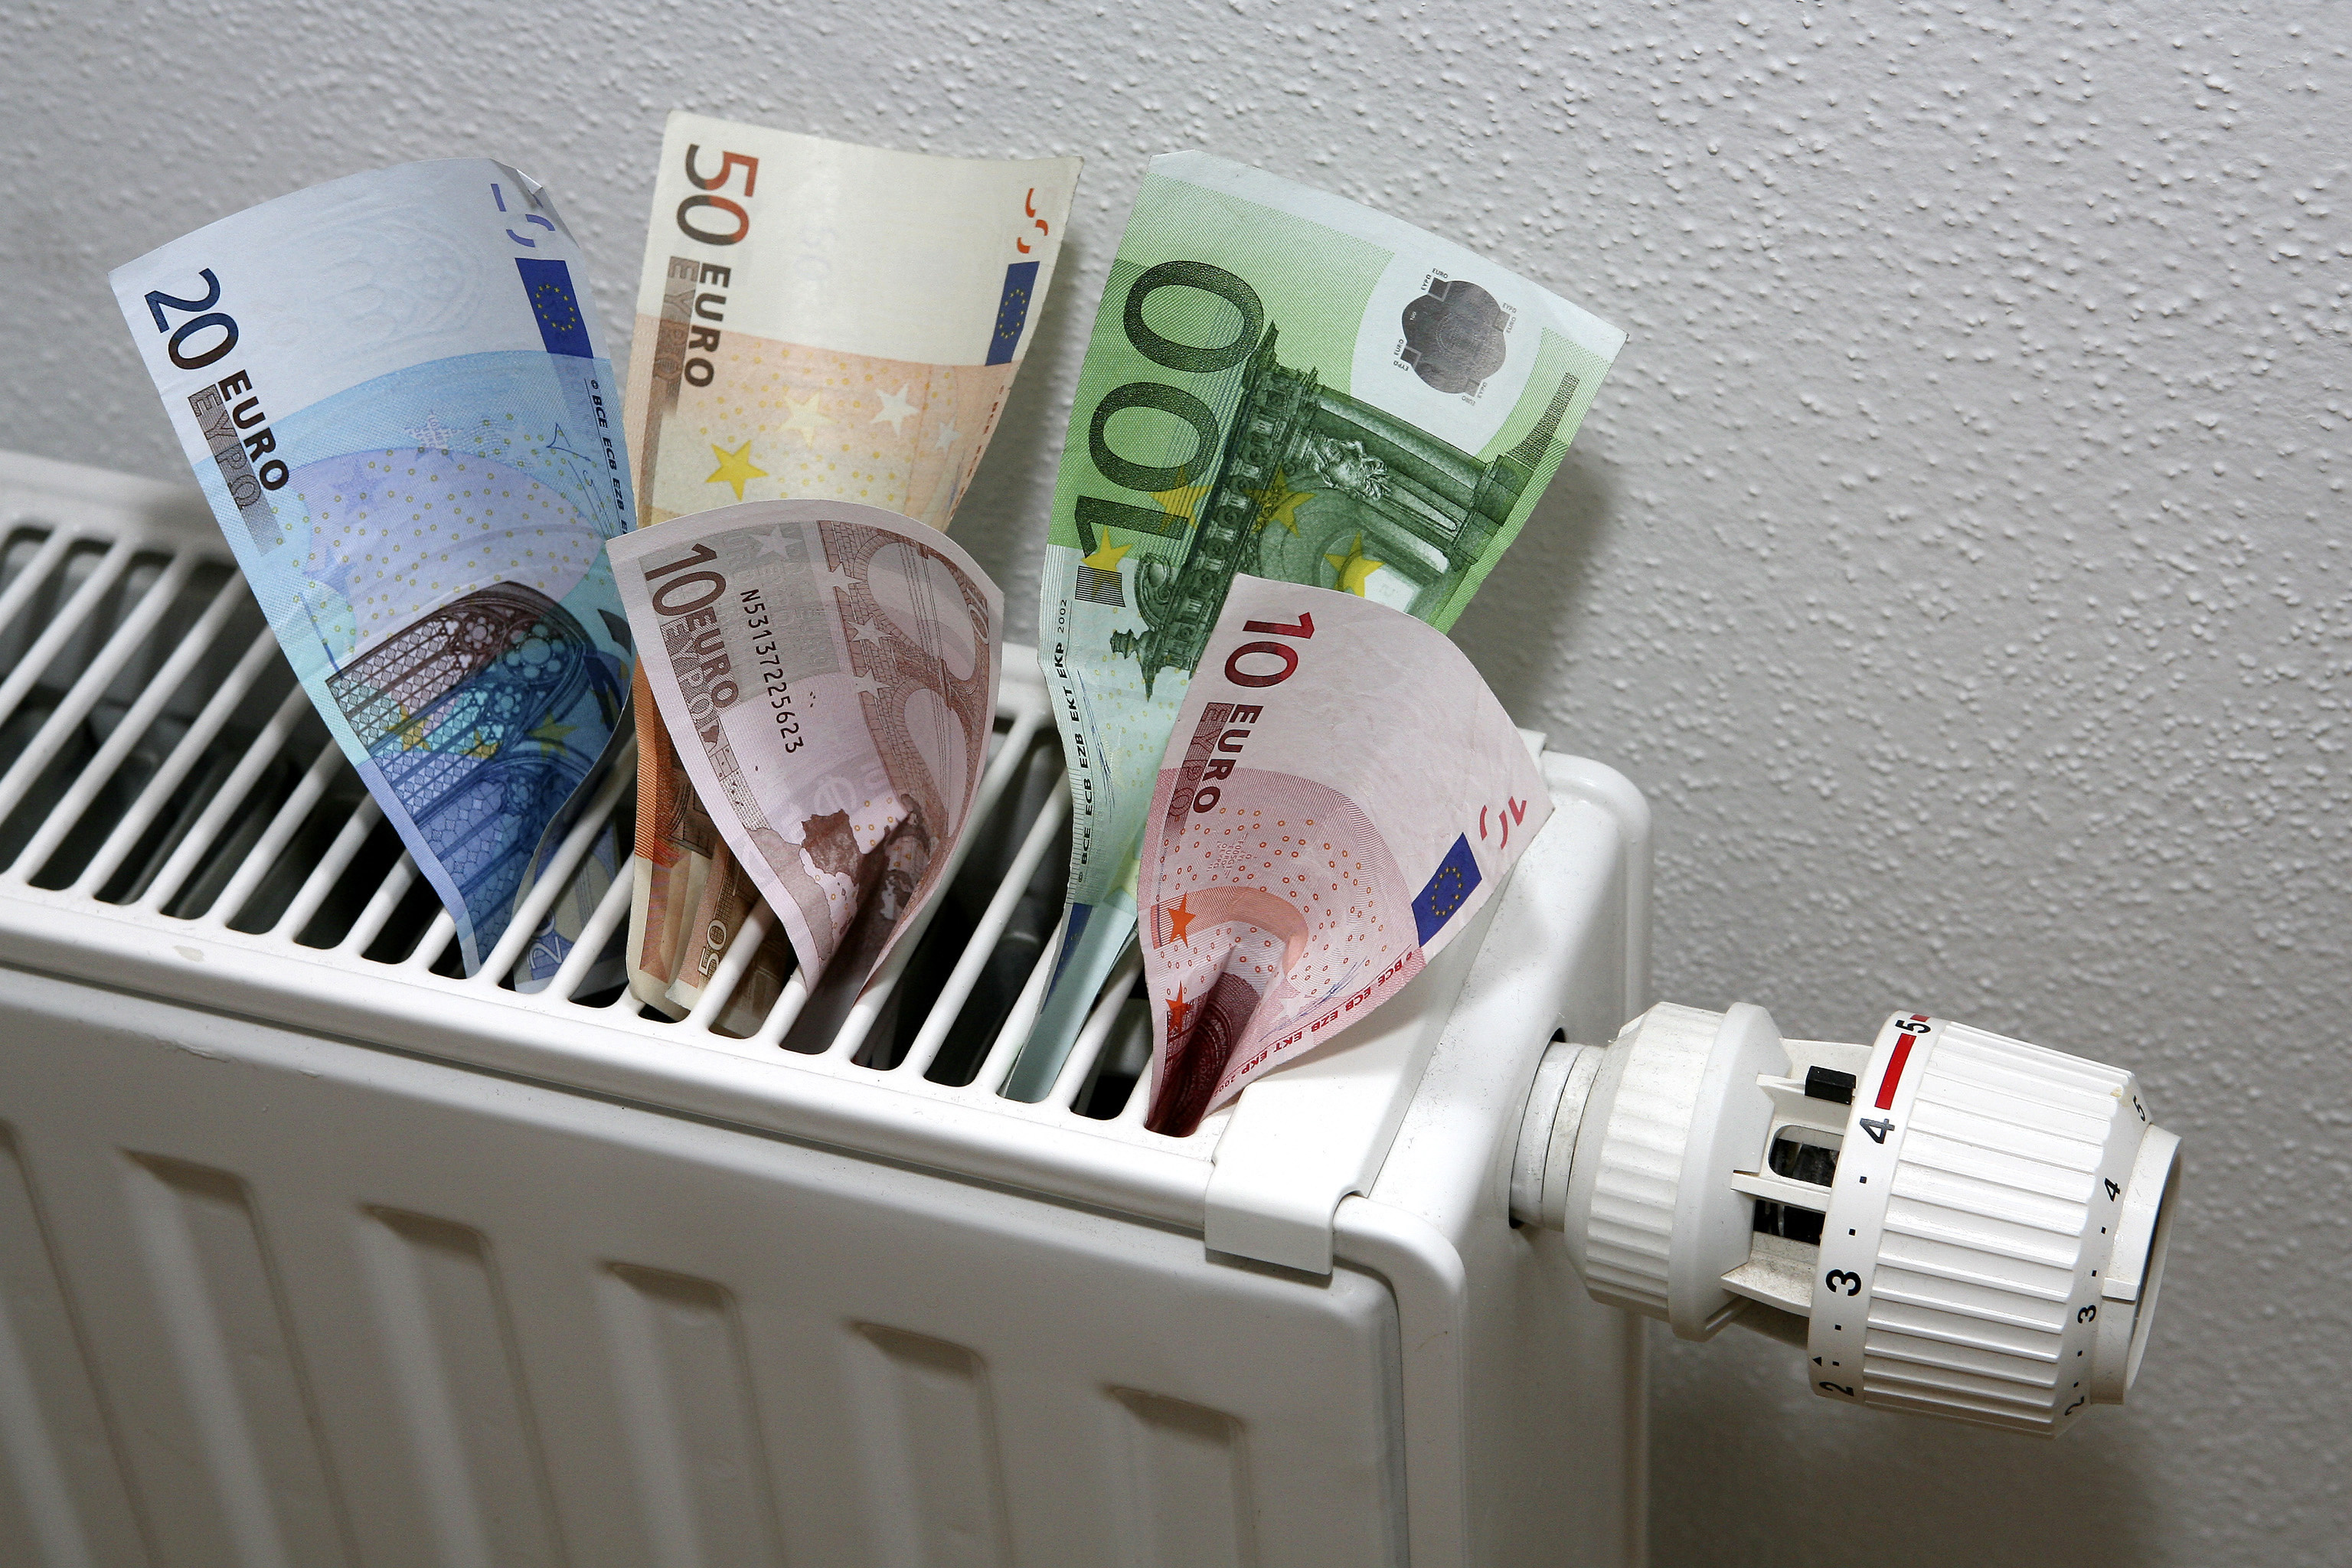 Neue Technologie statt teurer Wärme